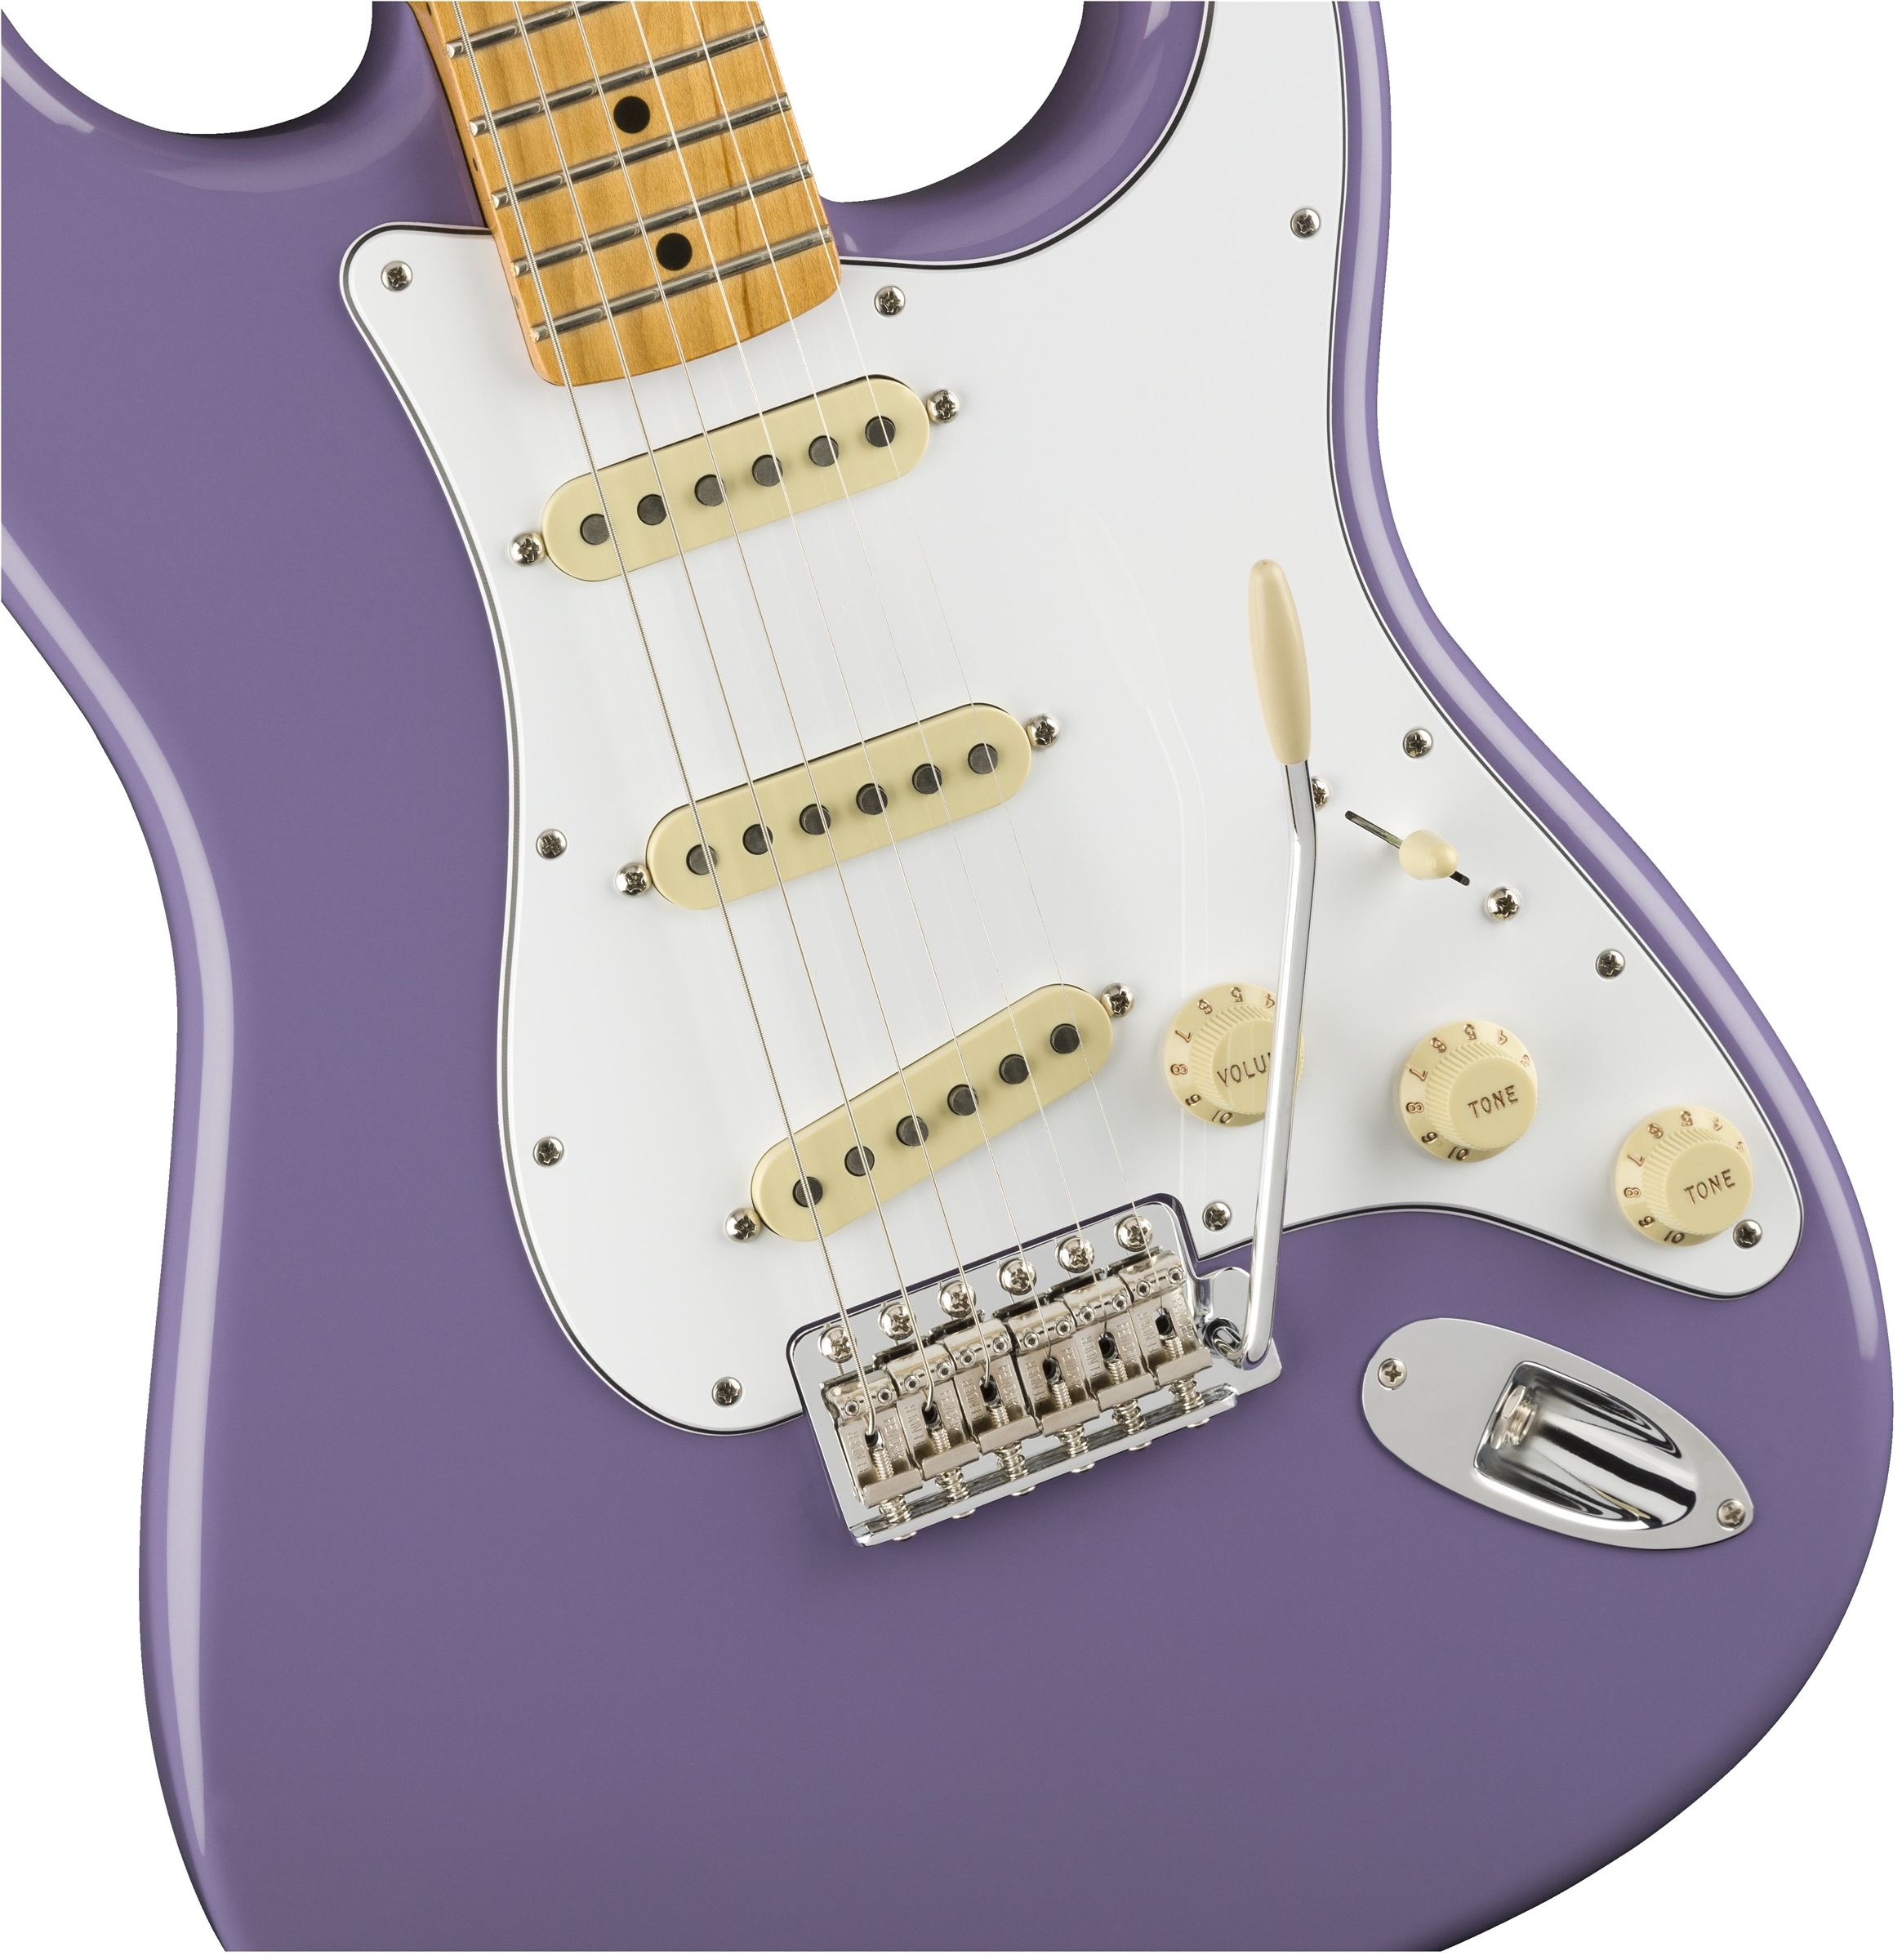 jimi hendrix stratocaster�  model #: 0145802326  tap to expand